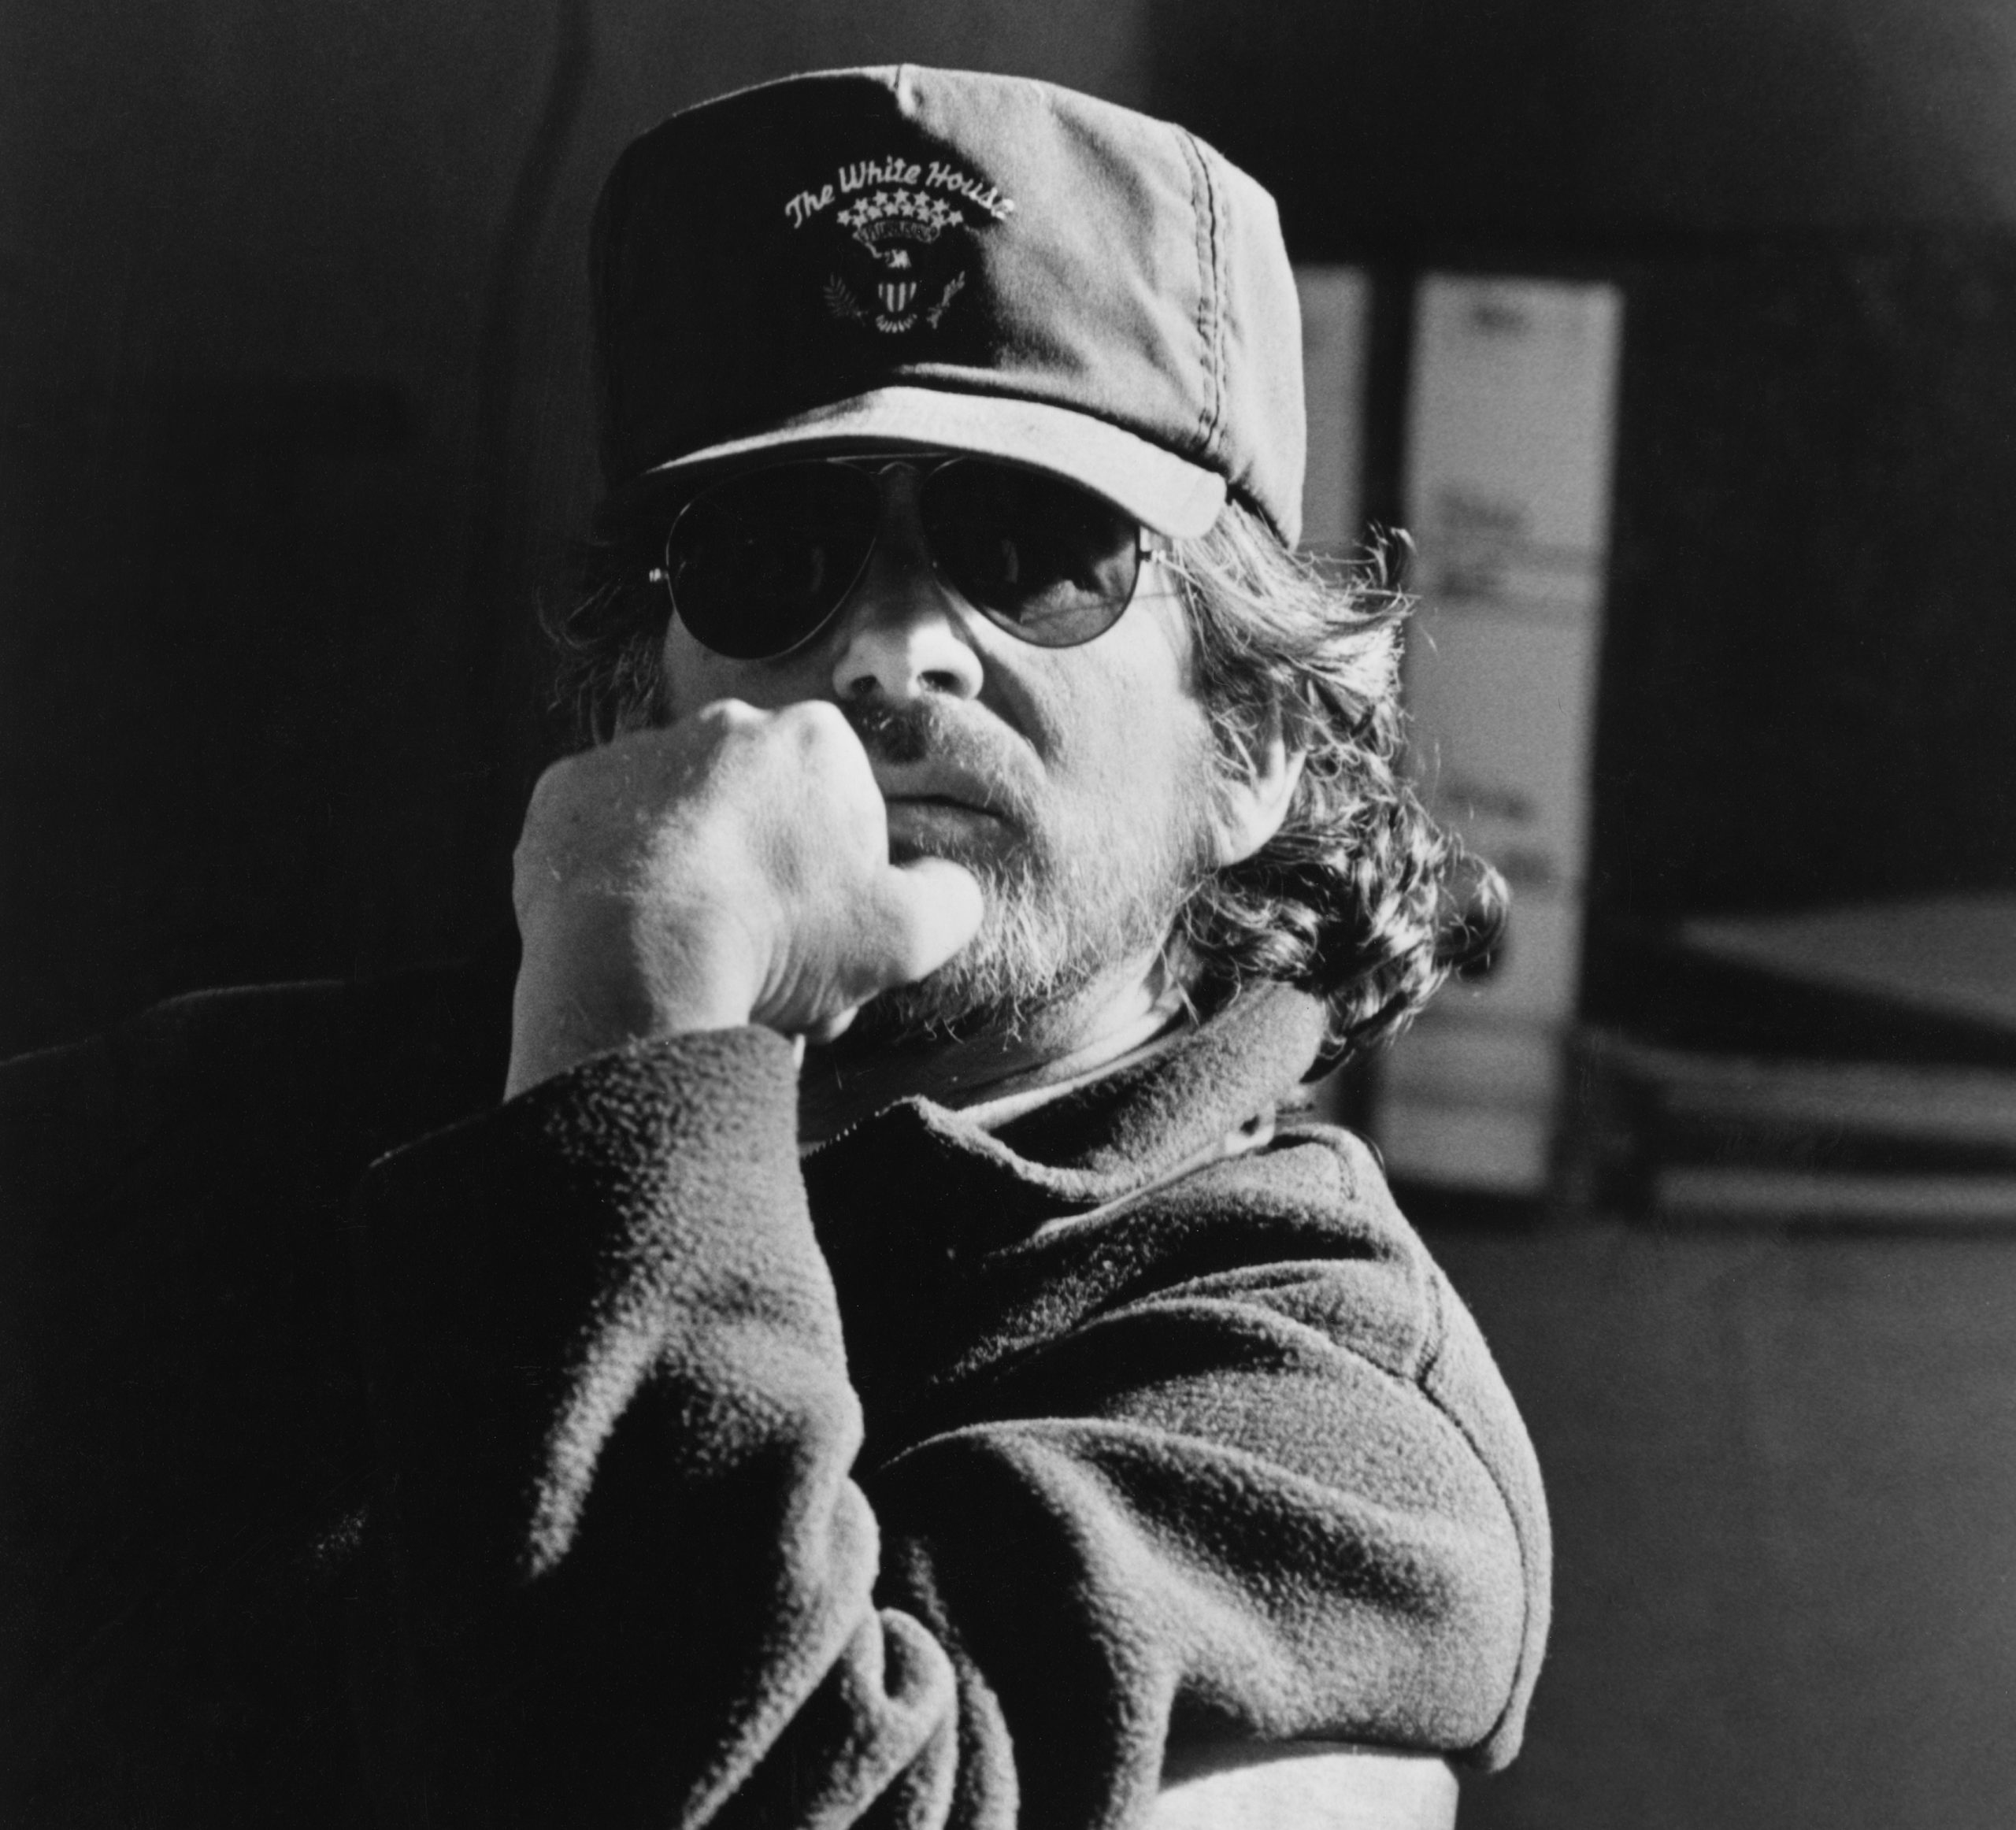 Steven Spielberg on set of Schindler's List